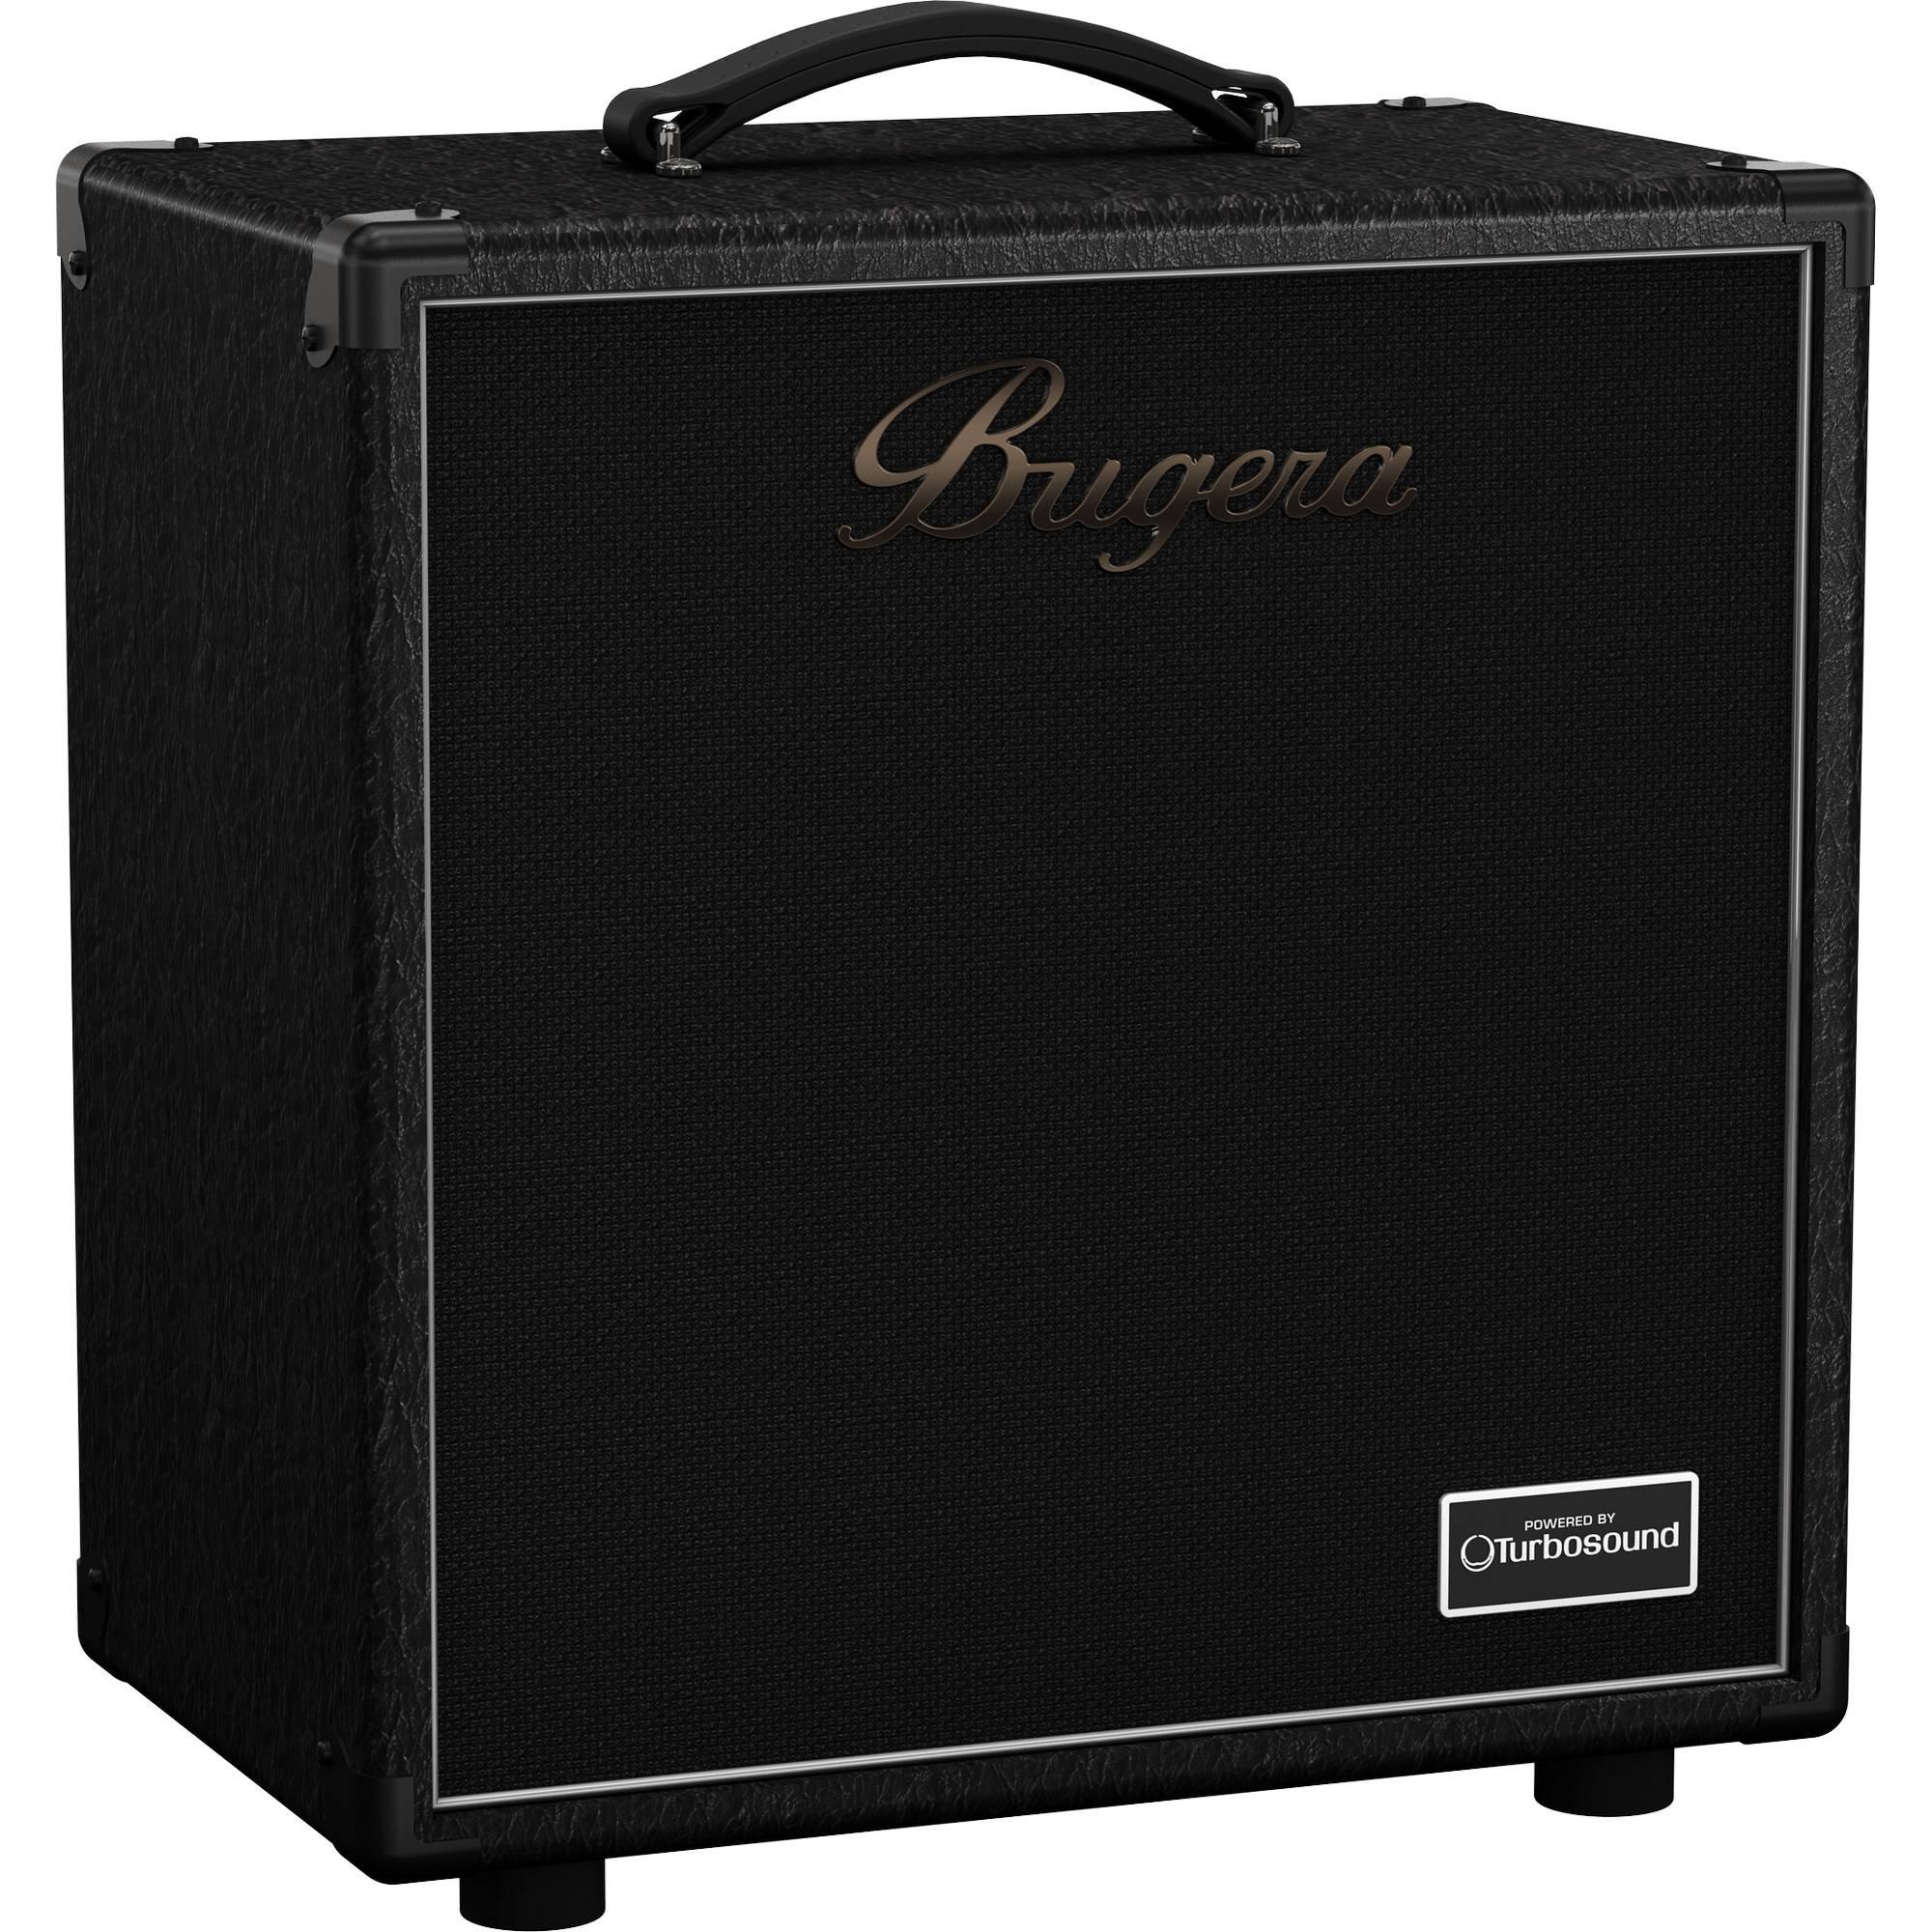 Fine Bugera 112Ts 1X12 80W Guitar Cabinet Download Free Architecture Designs Embacsunscenecom